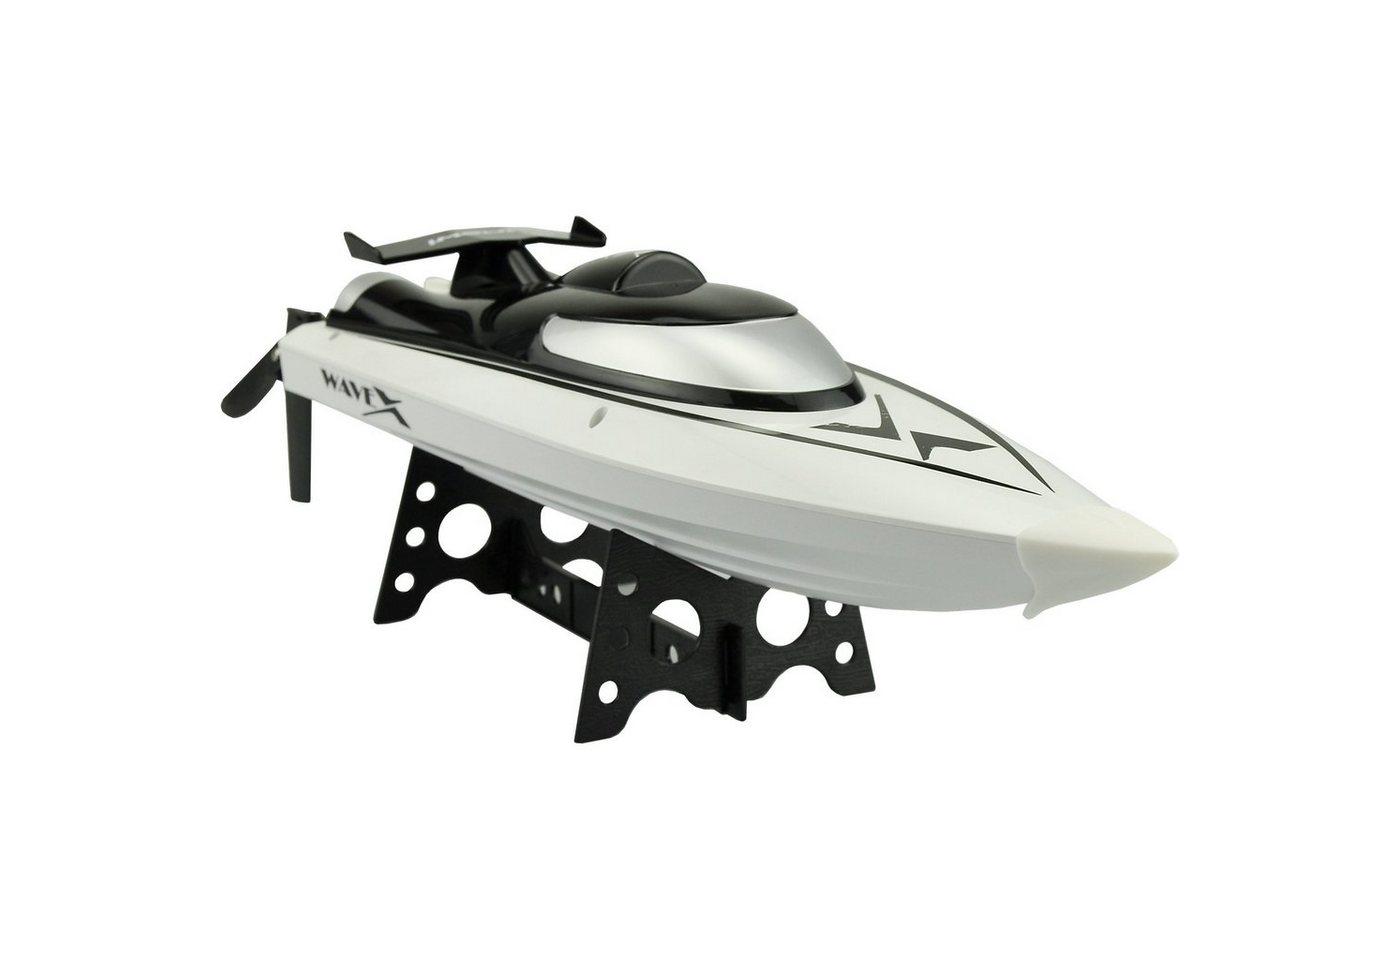 Amewi RC Modellbauboot WaveX Boot Brushless 46cm